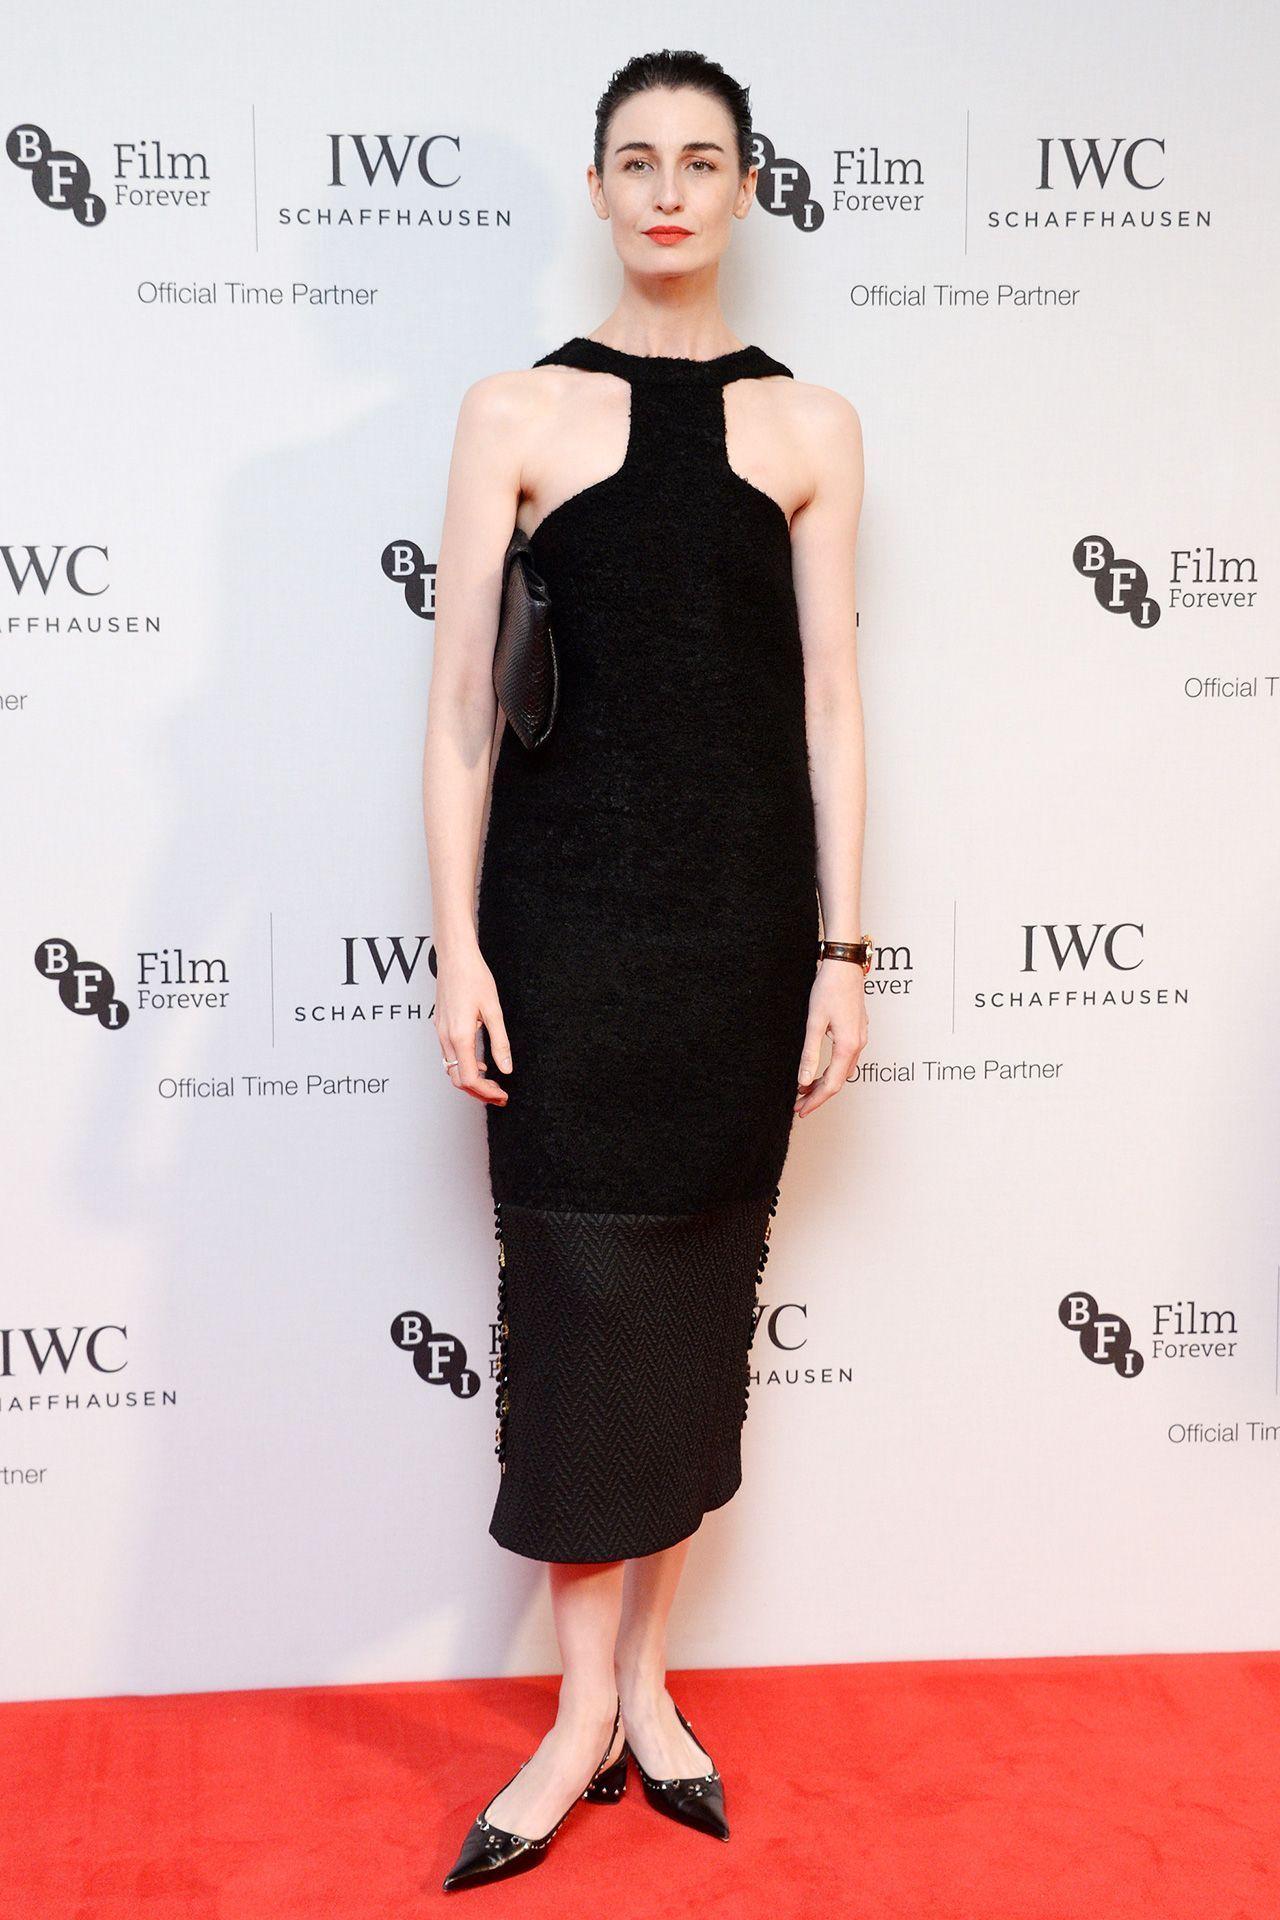 IWC gala, London – October 4 2016